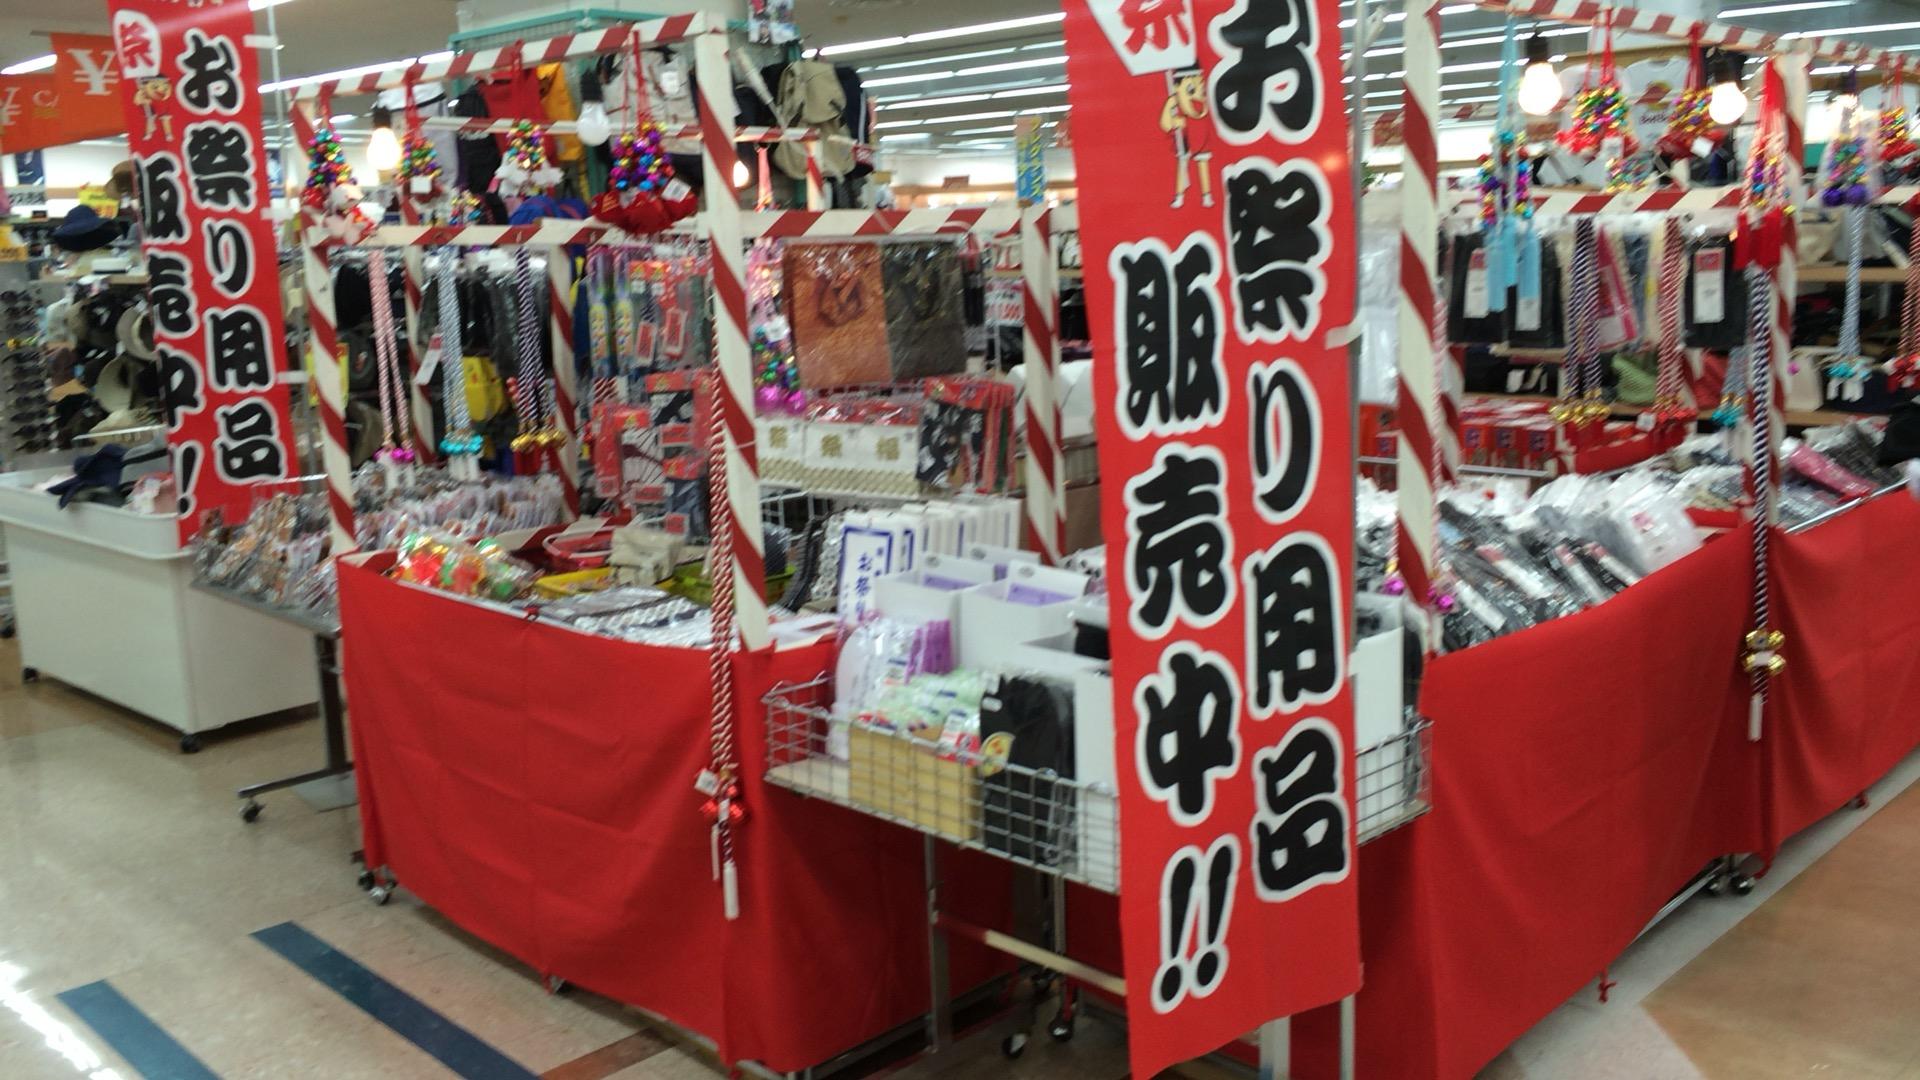 花巻祭り用品